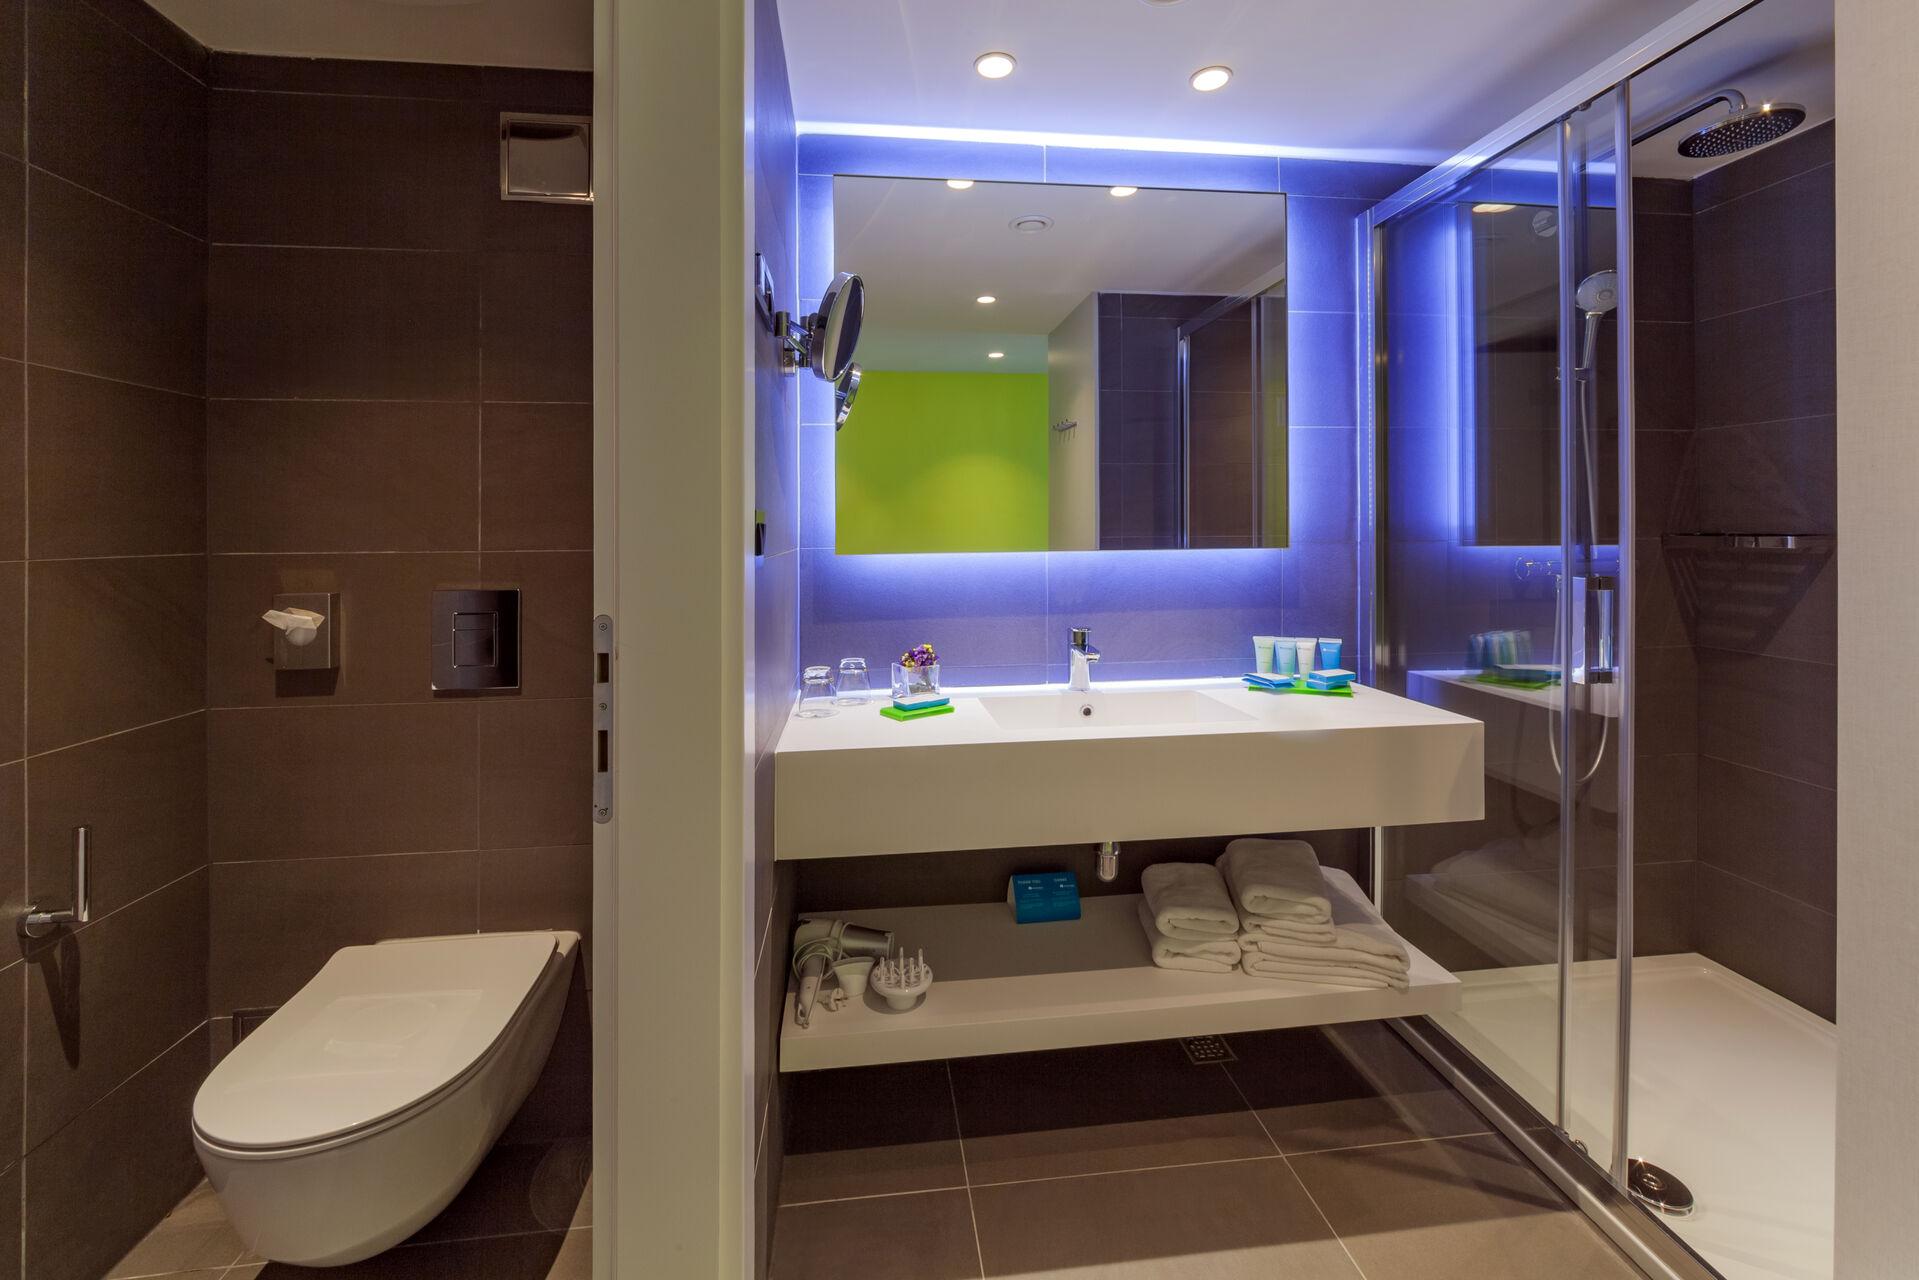 https://cms.satur.sk/data/imgs/tour_image/orig/bluesun_berulia-superior_double_room_sea_side_bathroom-1-1956635.jpg